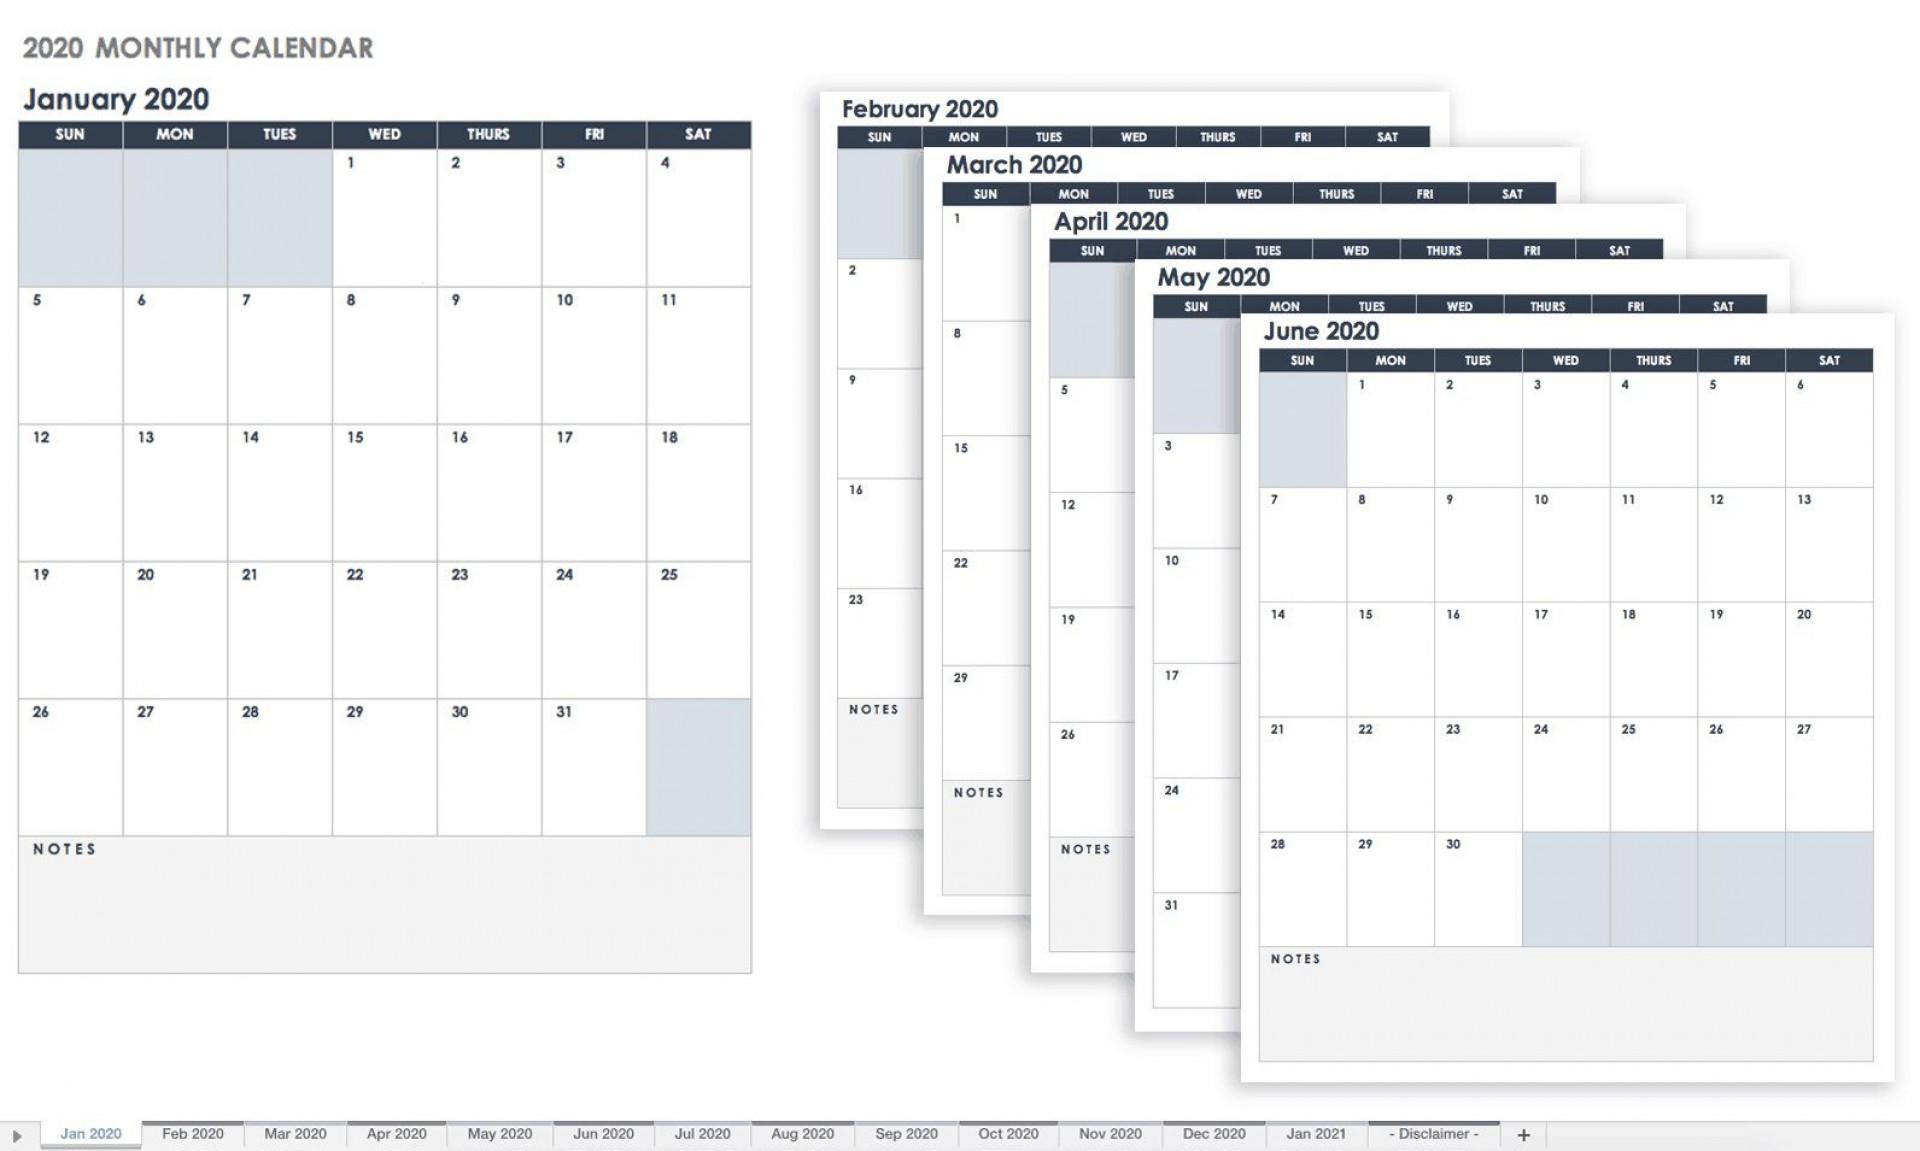 006 Breathtaking Google Sheet Calendar Template High Resolution  Templates Monthly Spreadsheet 2020 20181920